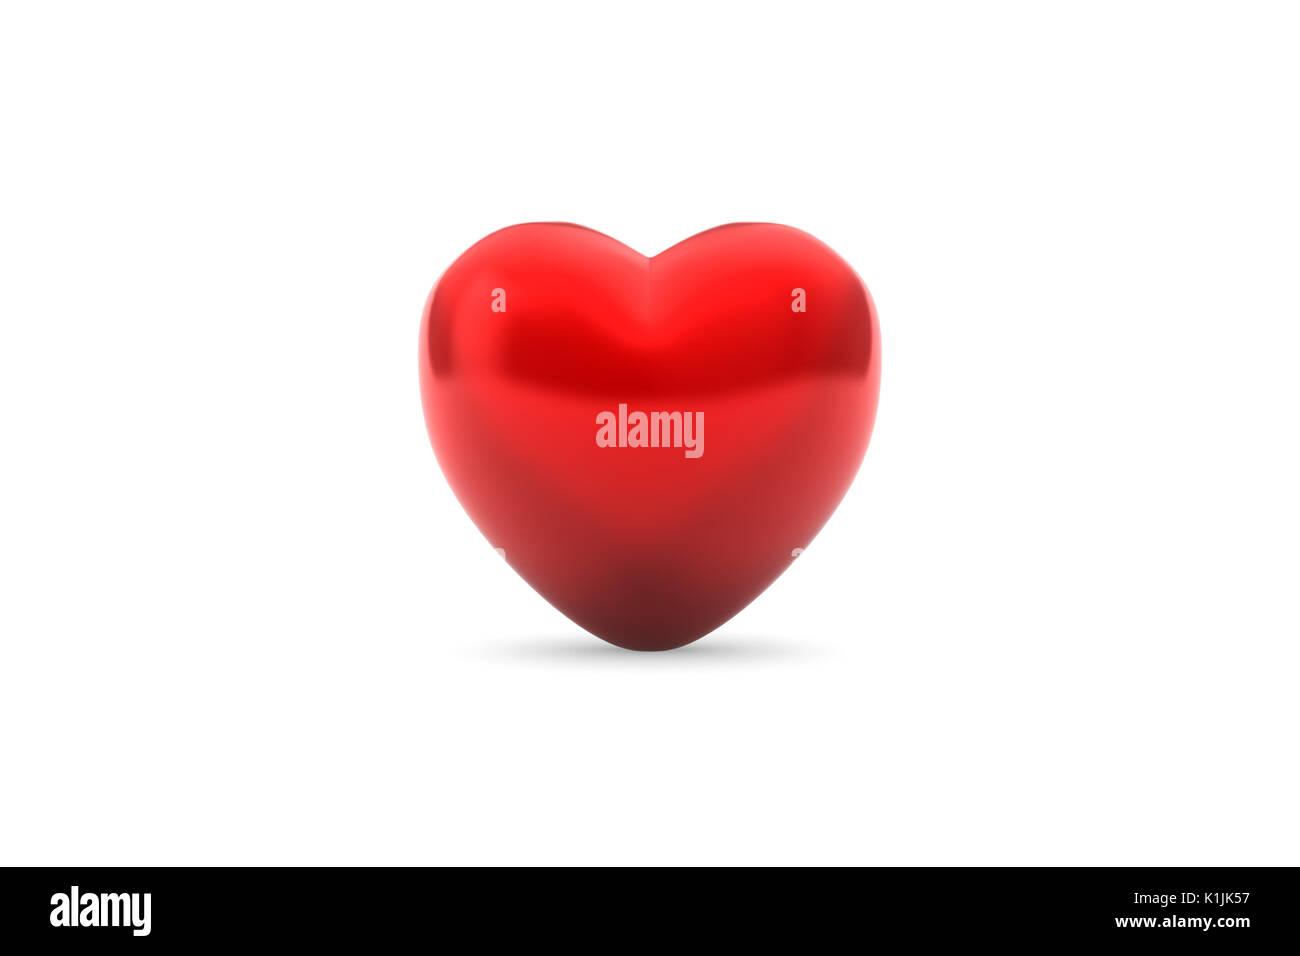 Realistic Heart Shaped Stock Photos Realistic Heart Shaped Stock